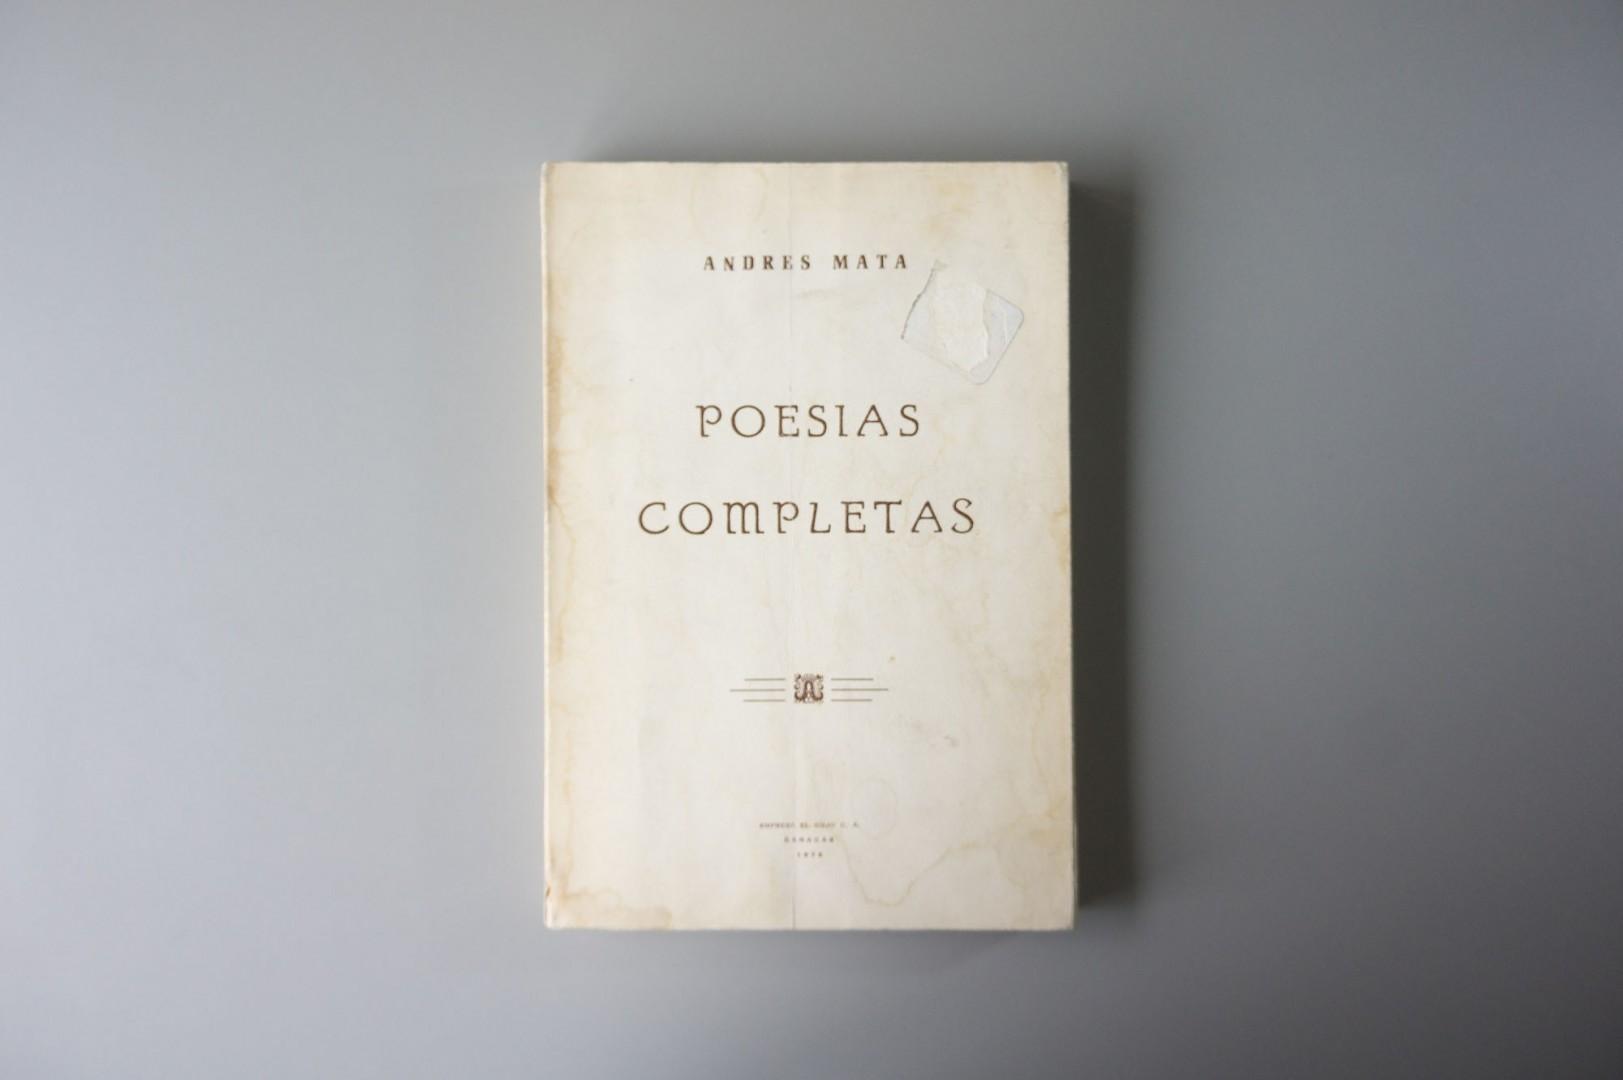 Andres Mata - Poesias Completas (1)